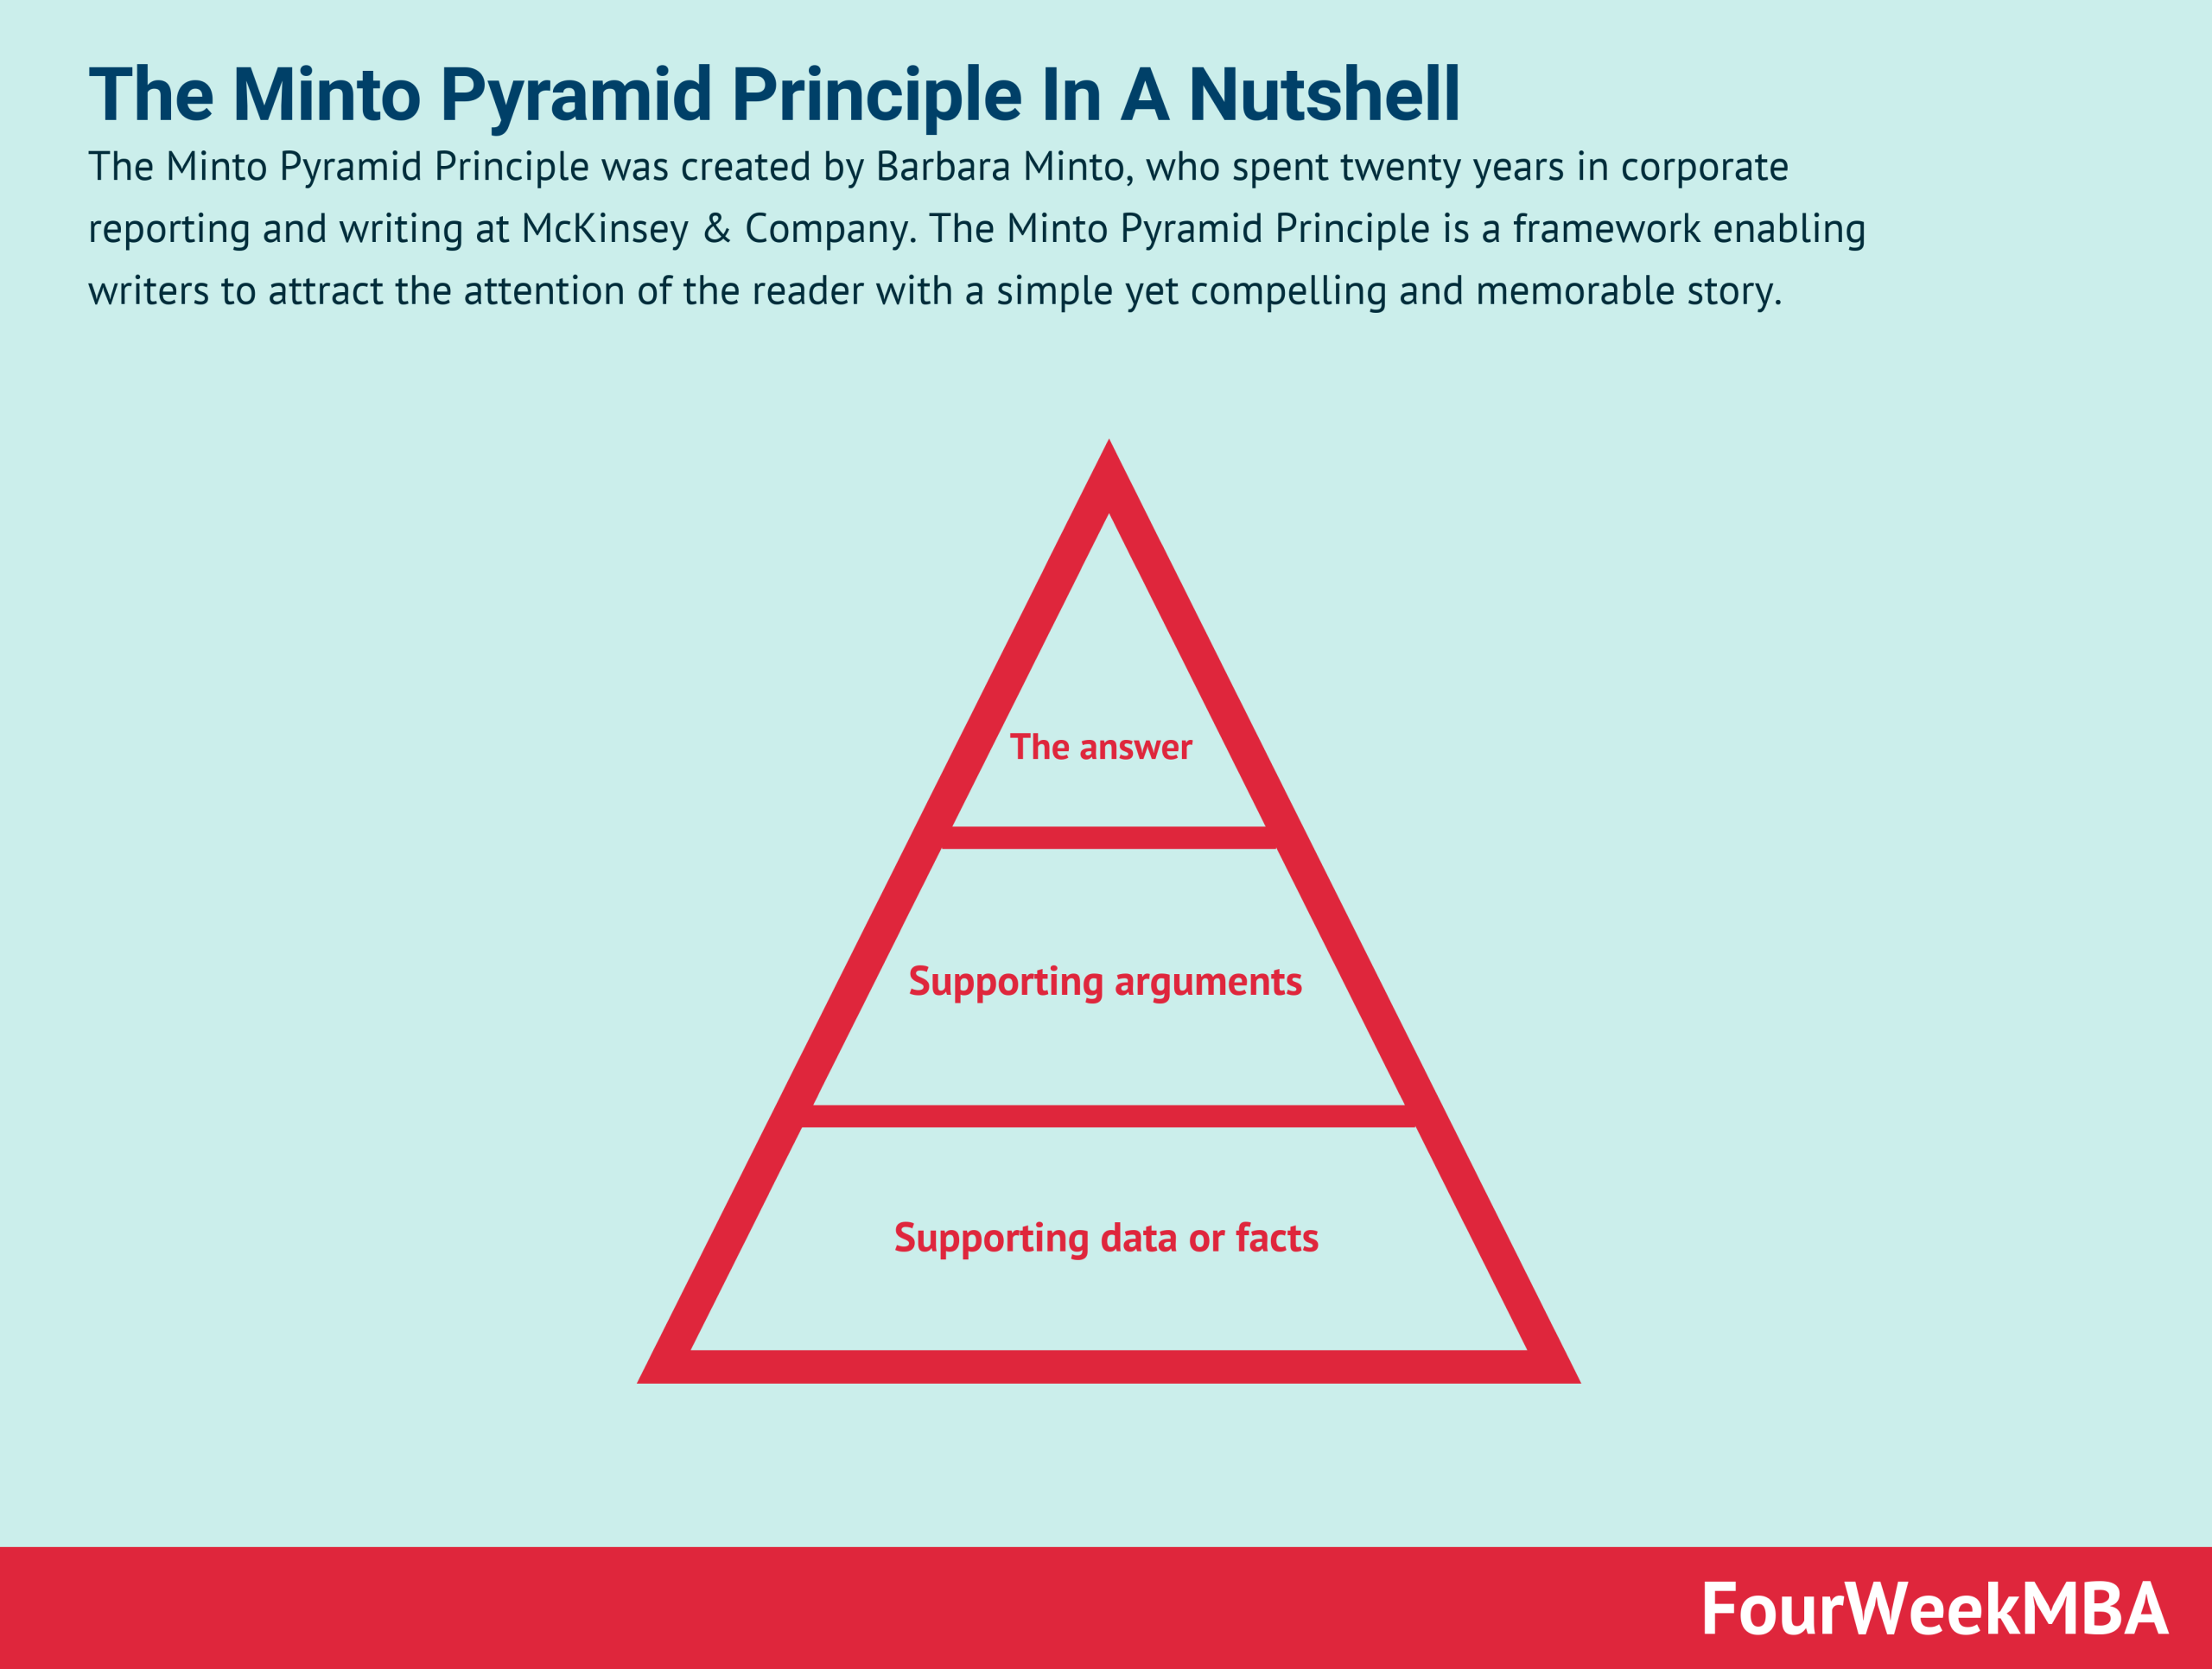 minto-pyramid-principle